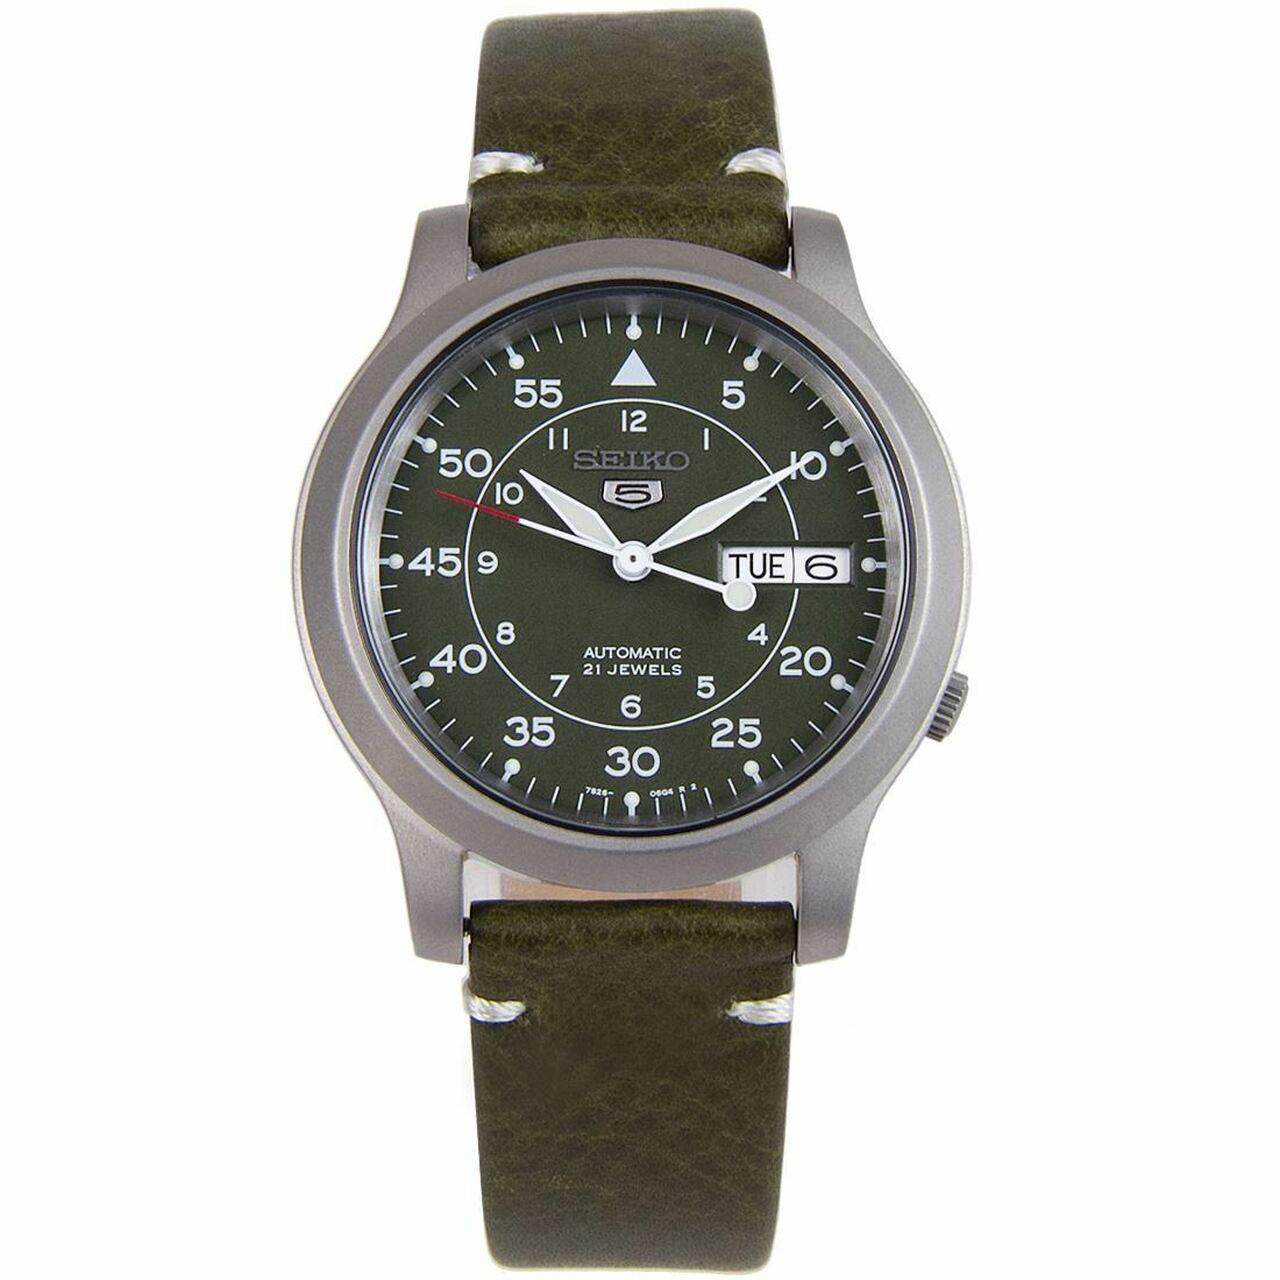 SNK805 SNK805K2 Seiko 5 Automatic Watch